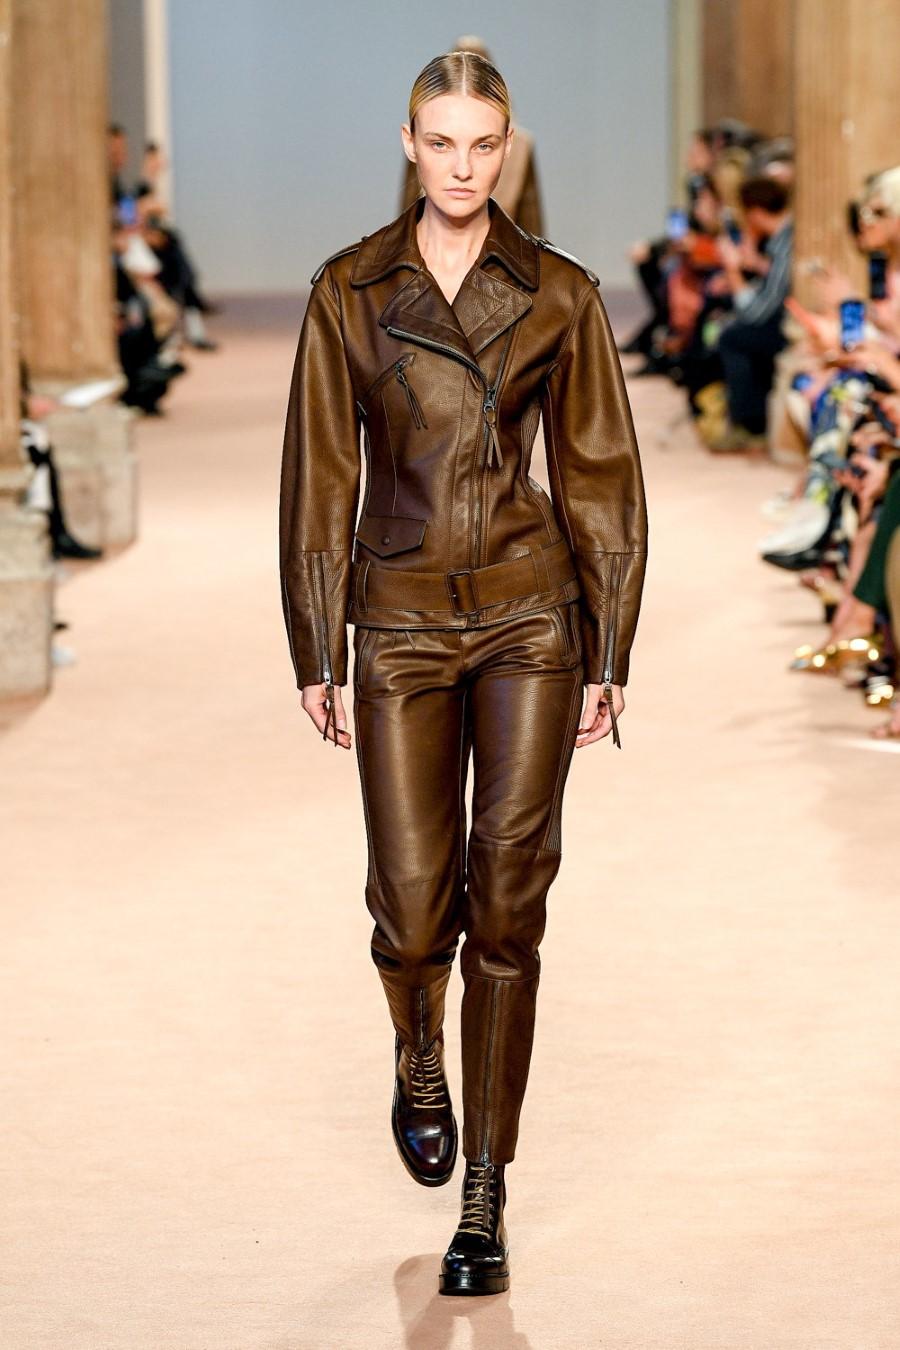 Salvatore Ferragamo - Fall Winter 2020 - Milan Fashion WeekSalvatore Ferragamo - Fall Winter 2020 - Milan Fashion Week